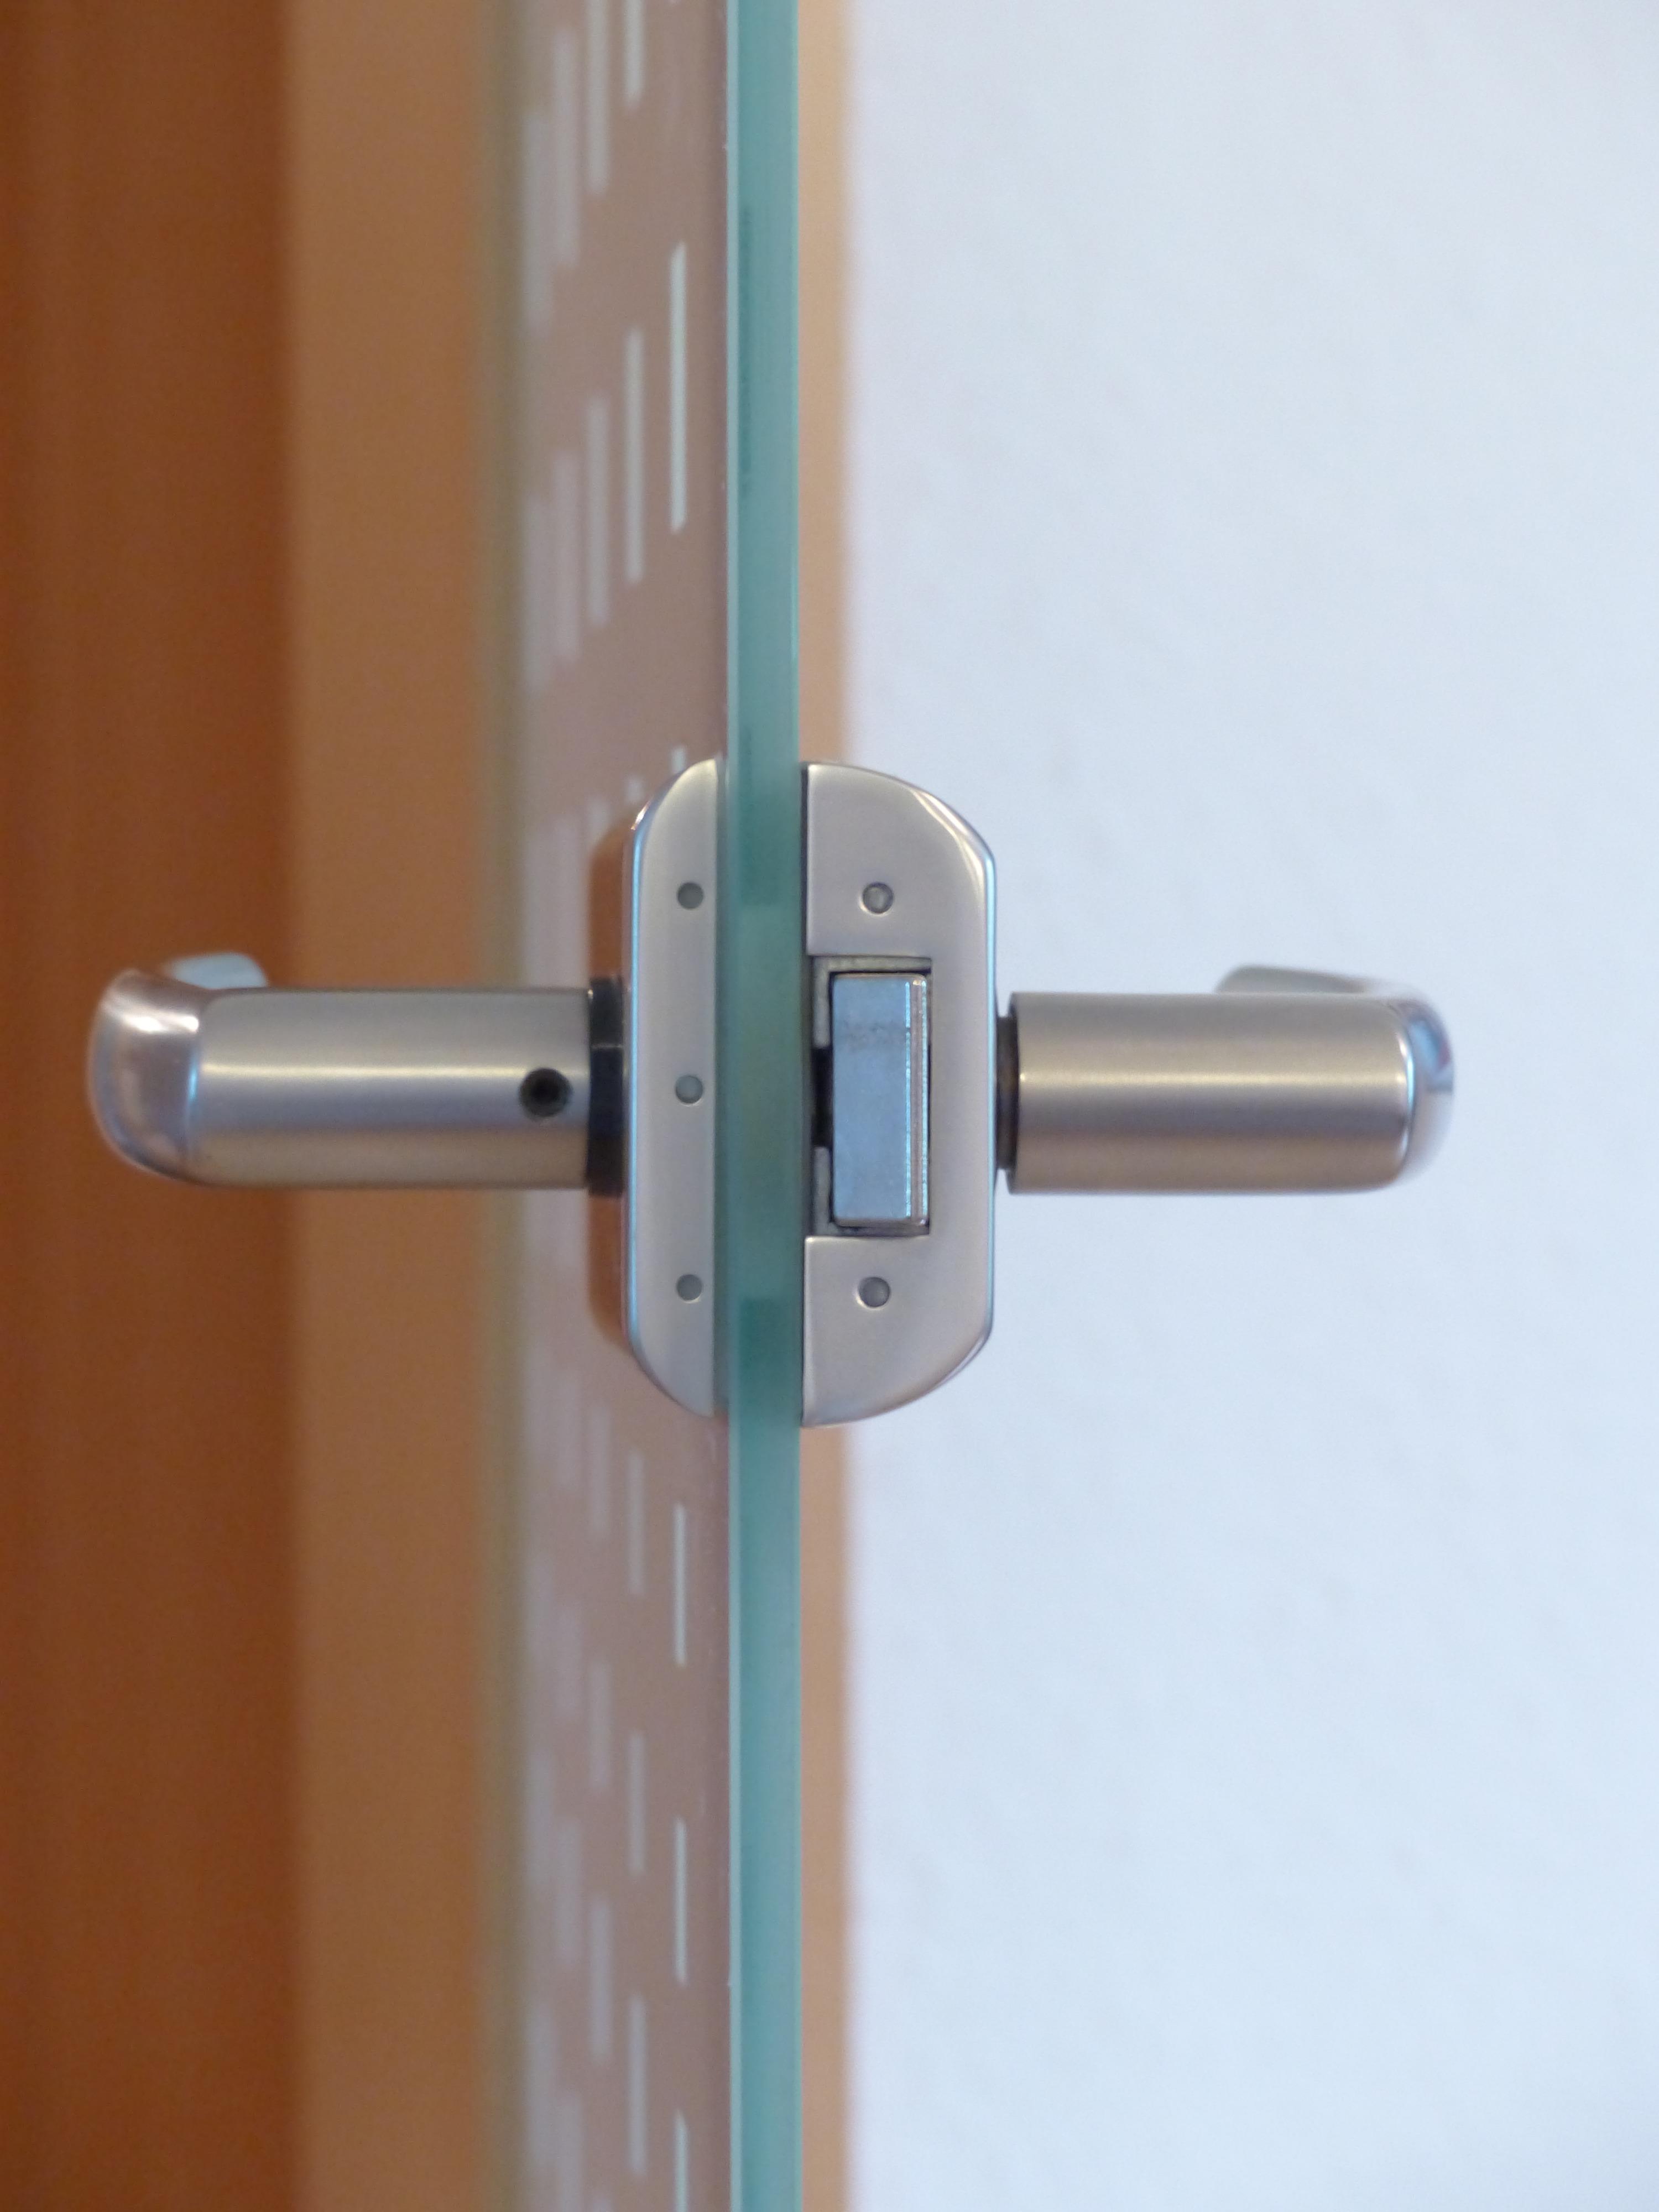 Free Images Hand Metal Security Product Front Door Jack